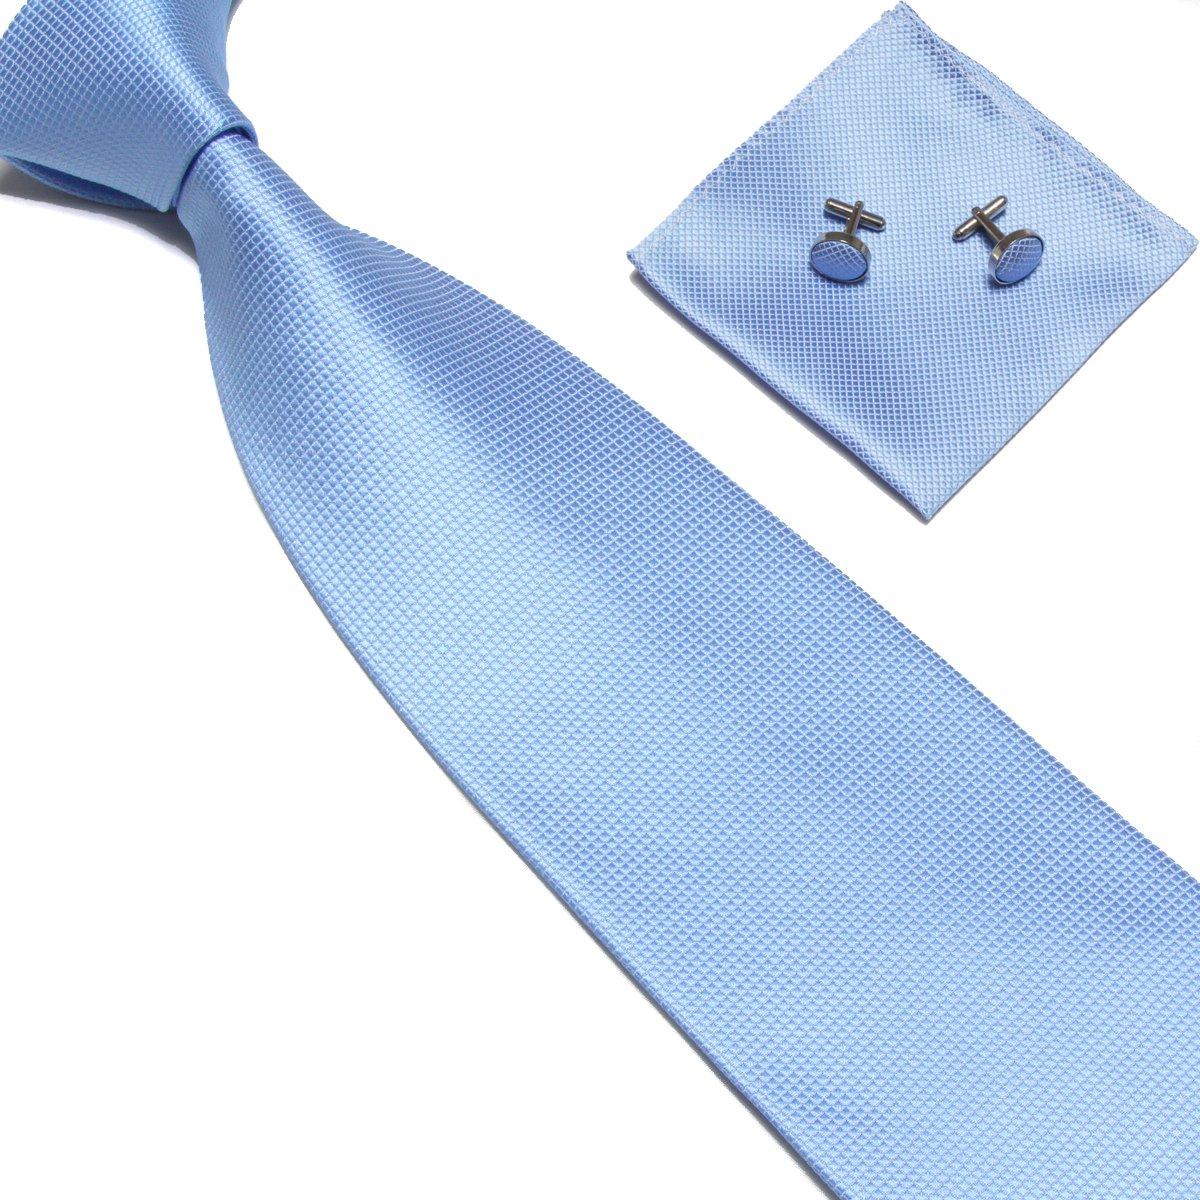 Stylefad Men's Solid Plaid Wide Neck Tie Set Hanky Cufflink